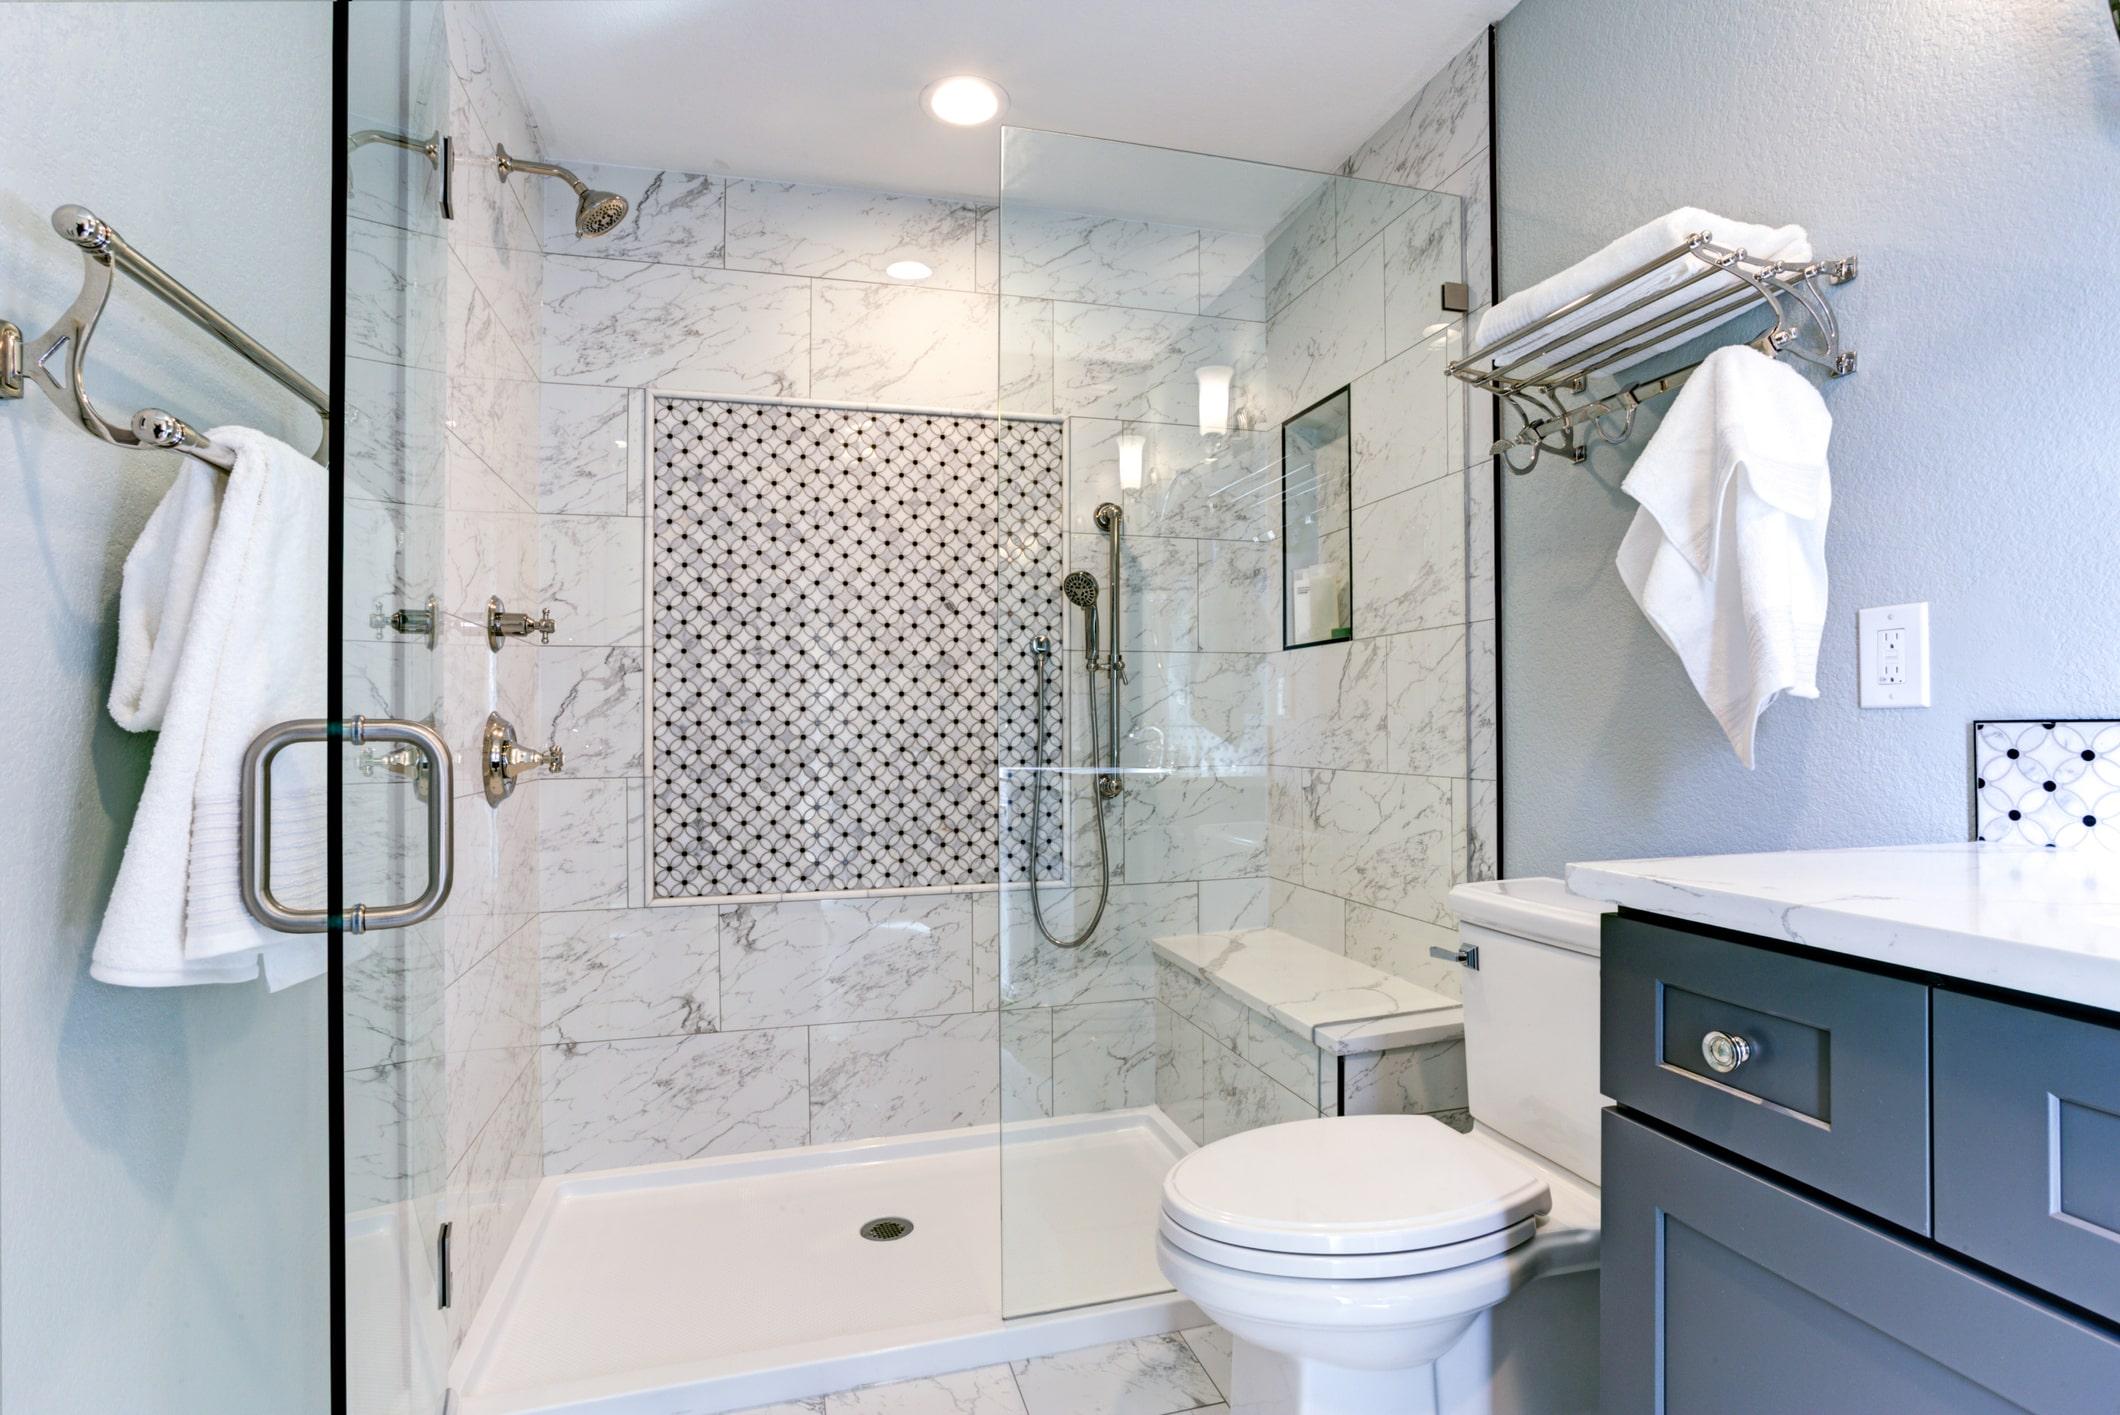 why your bathroom smells like sulfur